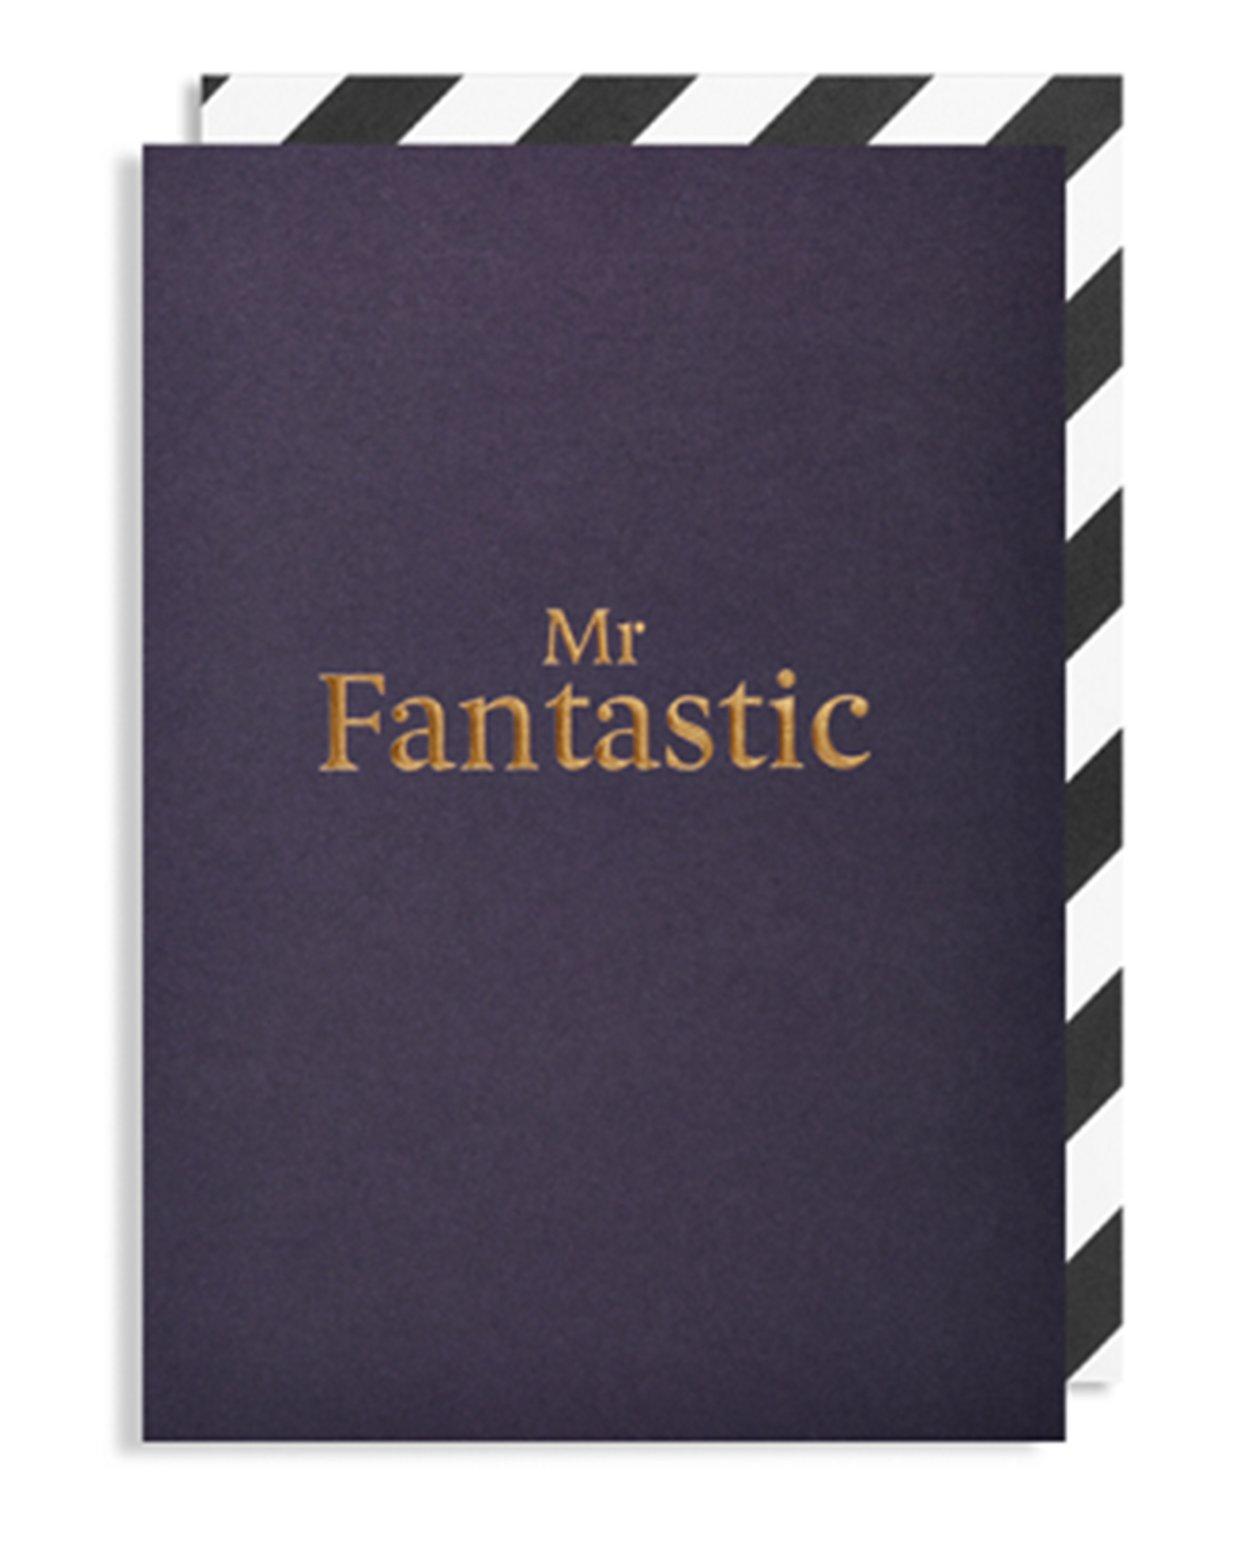 Mr Fantastic Card